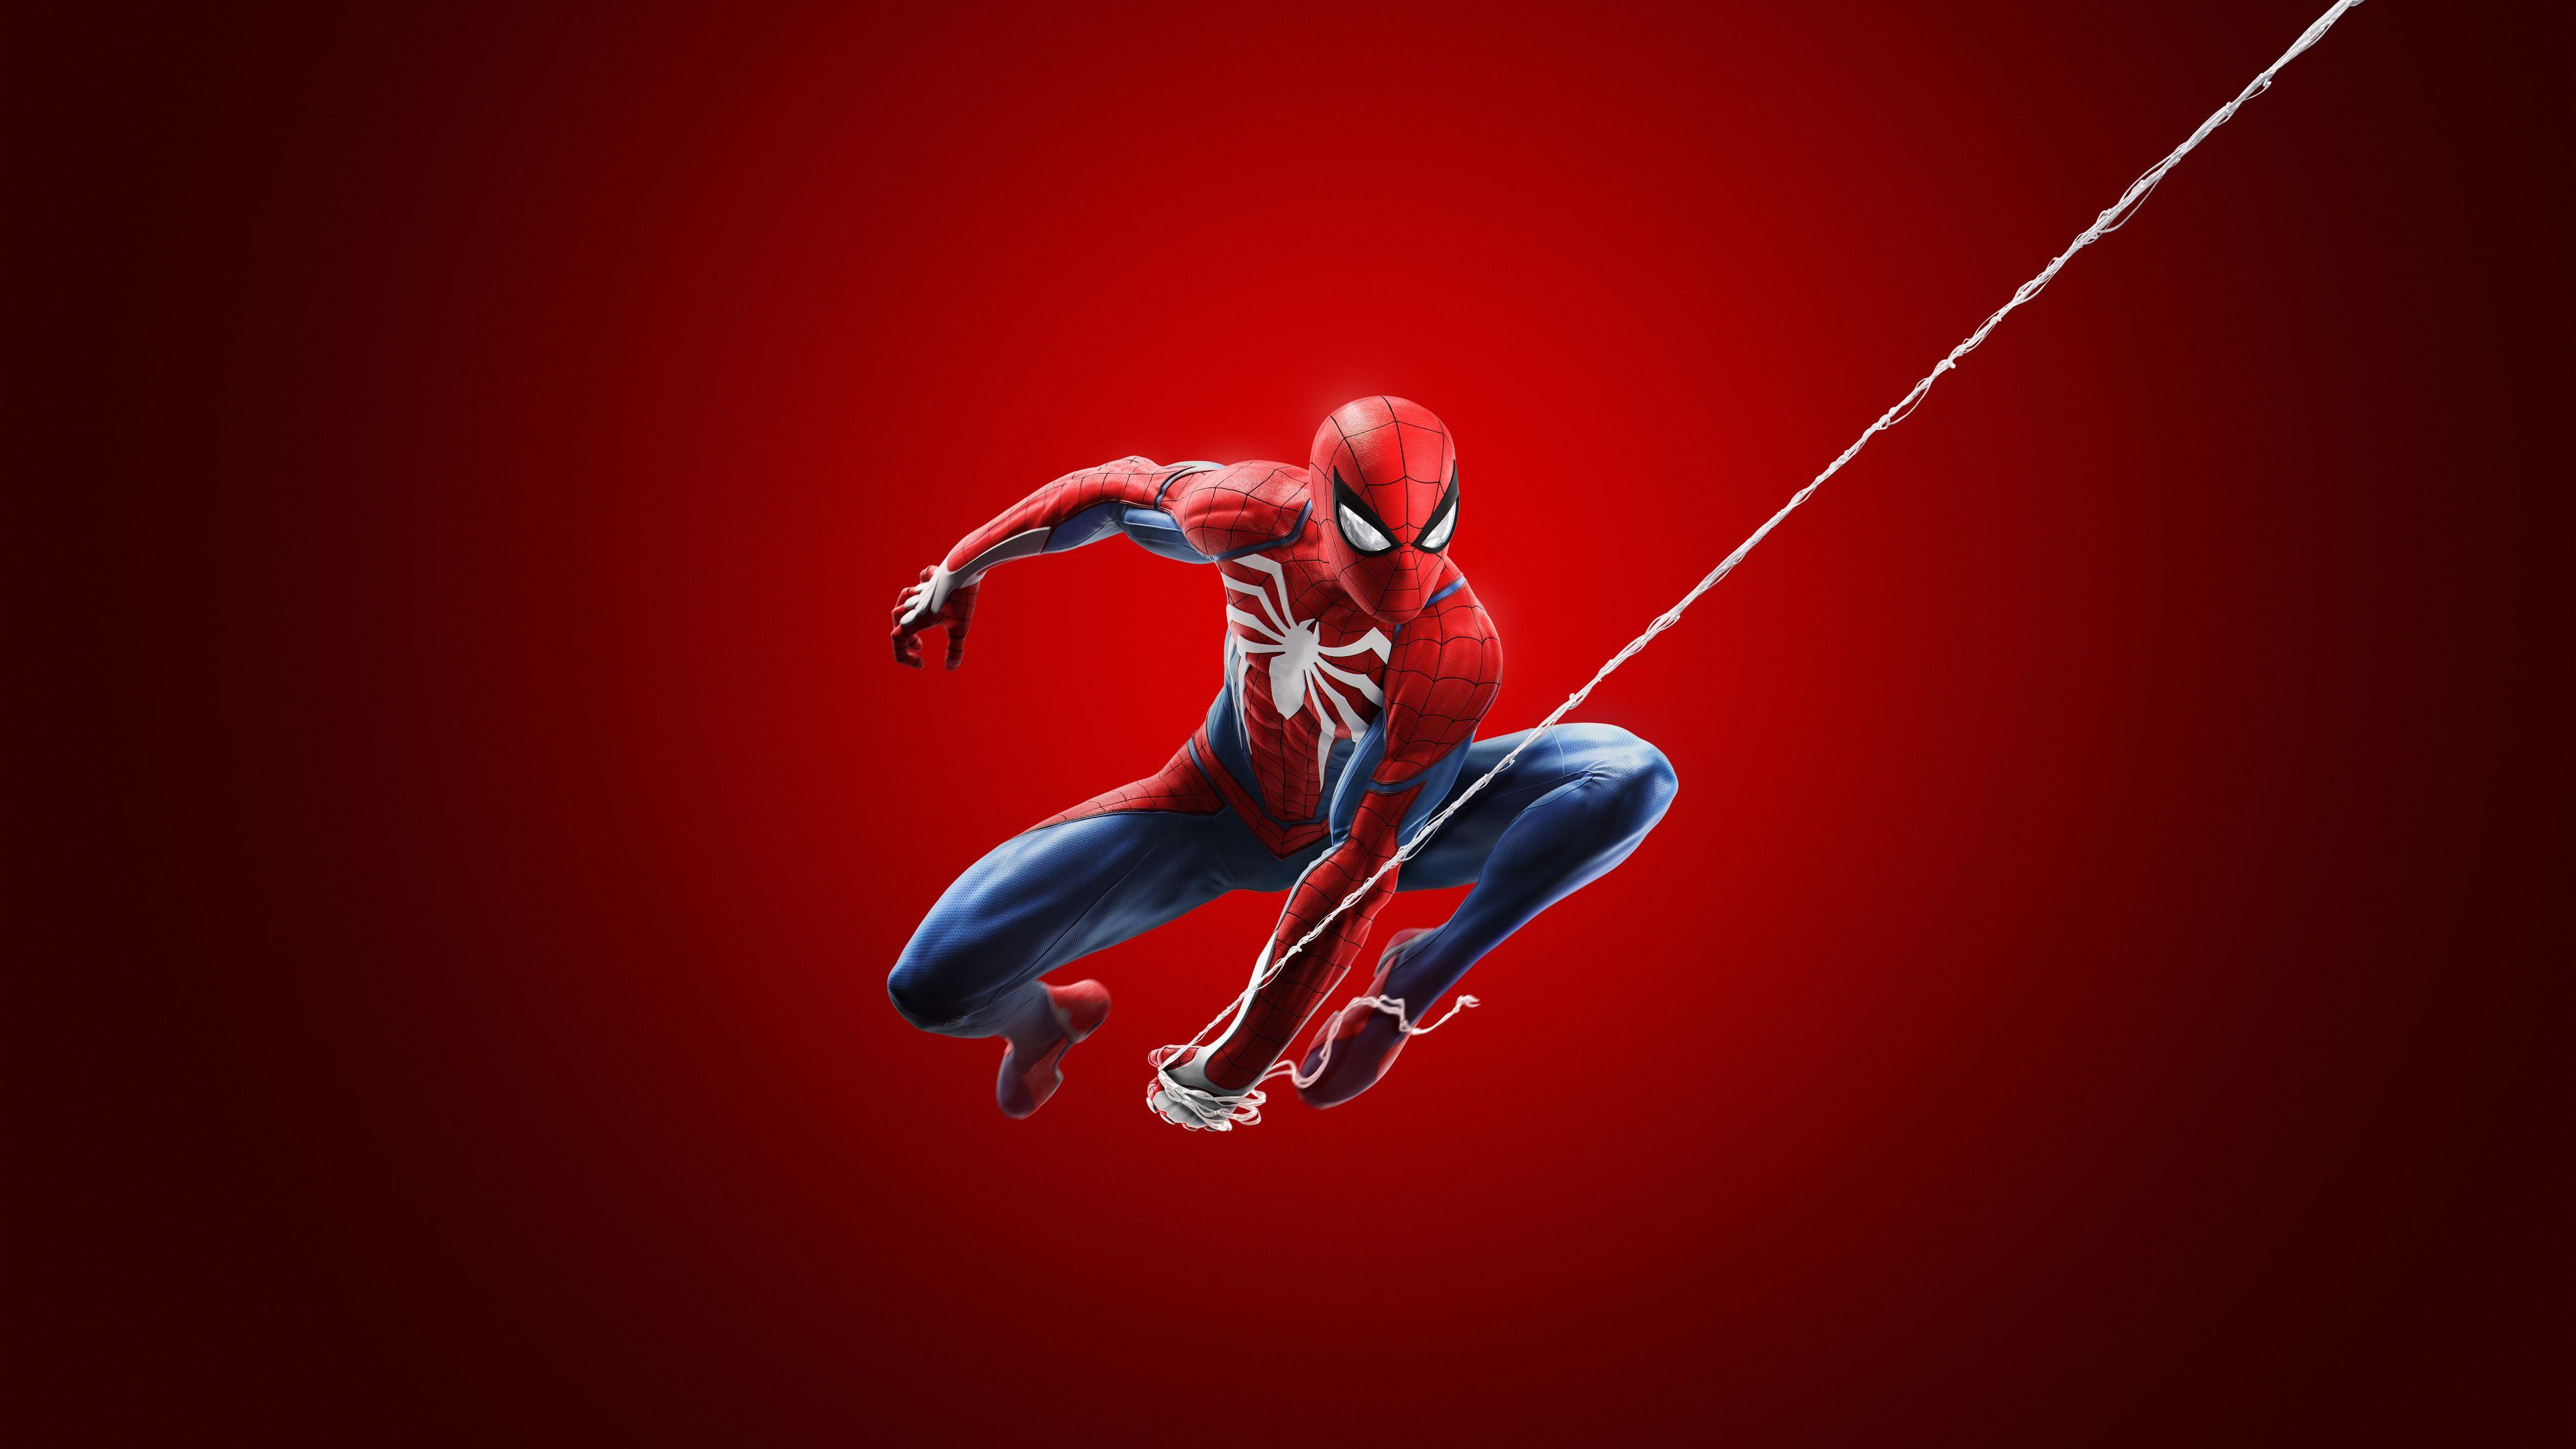 Spiderman Ps4 4k Spiderman Wallpapers Spiderman Ps4 Wallpapers Ps Games Wallpapers Hd Wallpapers Gam Spiderman Ps4 Wallpaper Spiderman Ps4 Marvel Spiderman